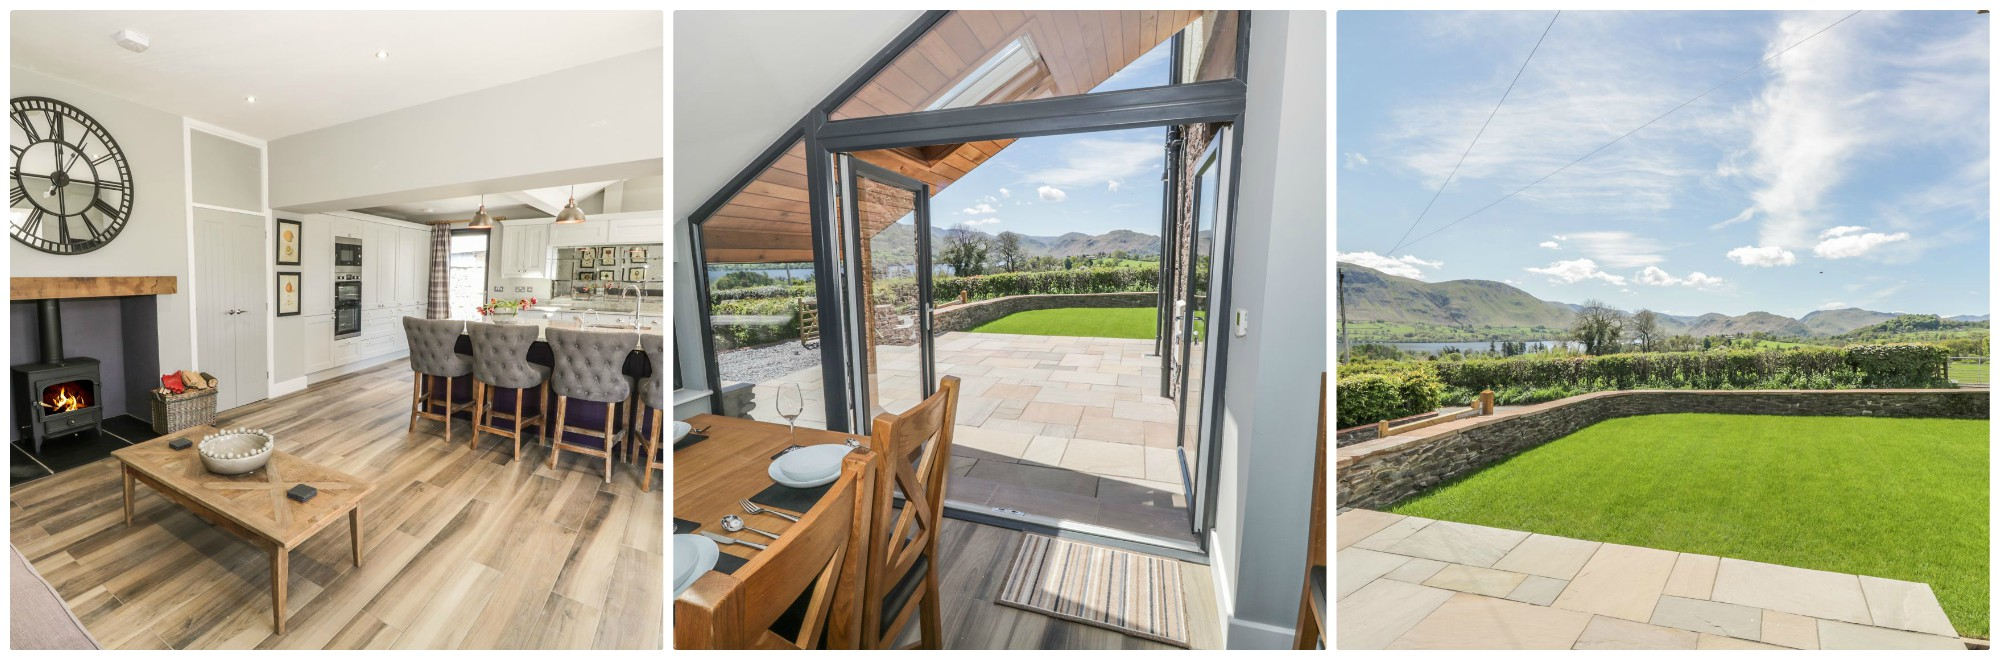 Stunning Lake Views from this fabulous modern Lake District holiday let near Ullswater